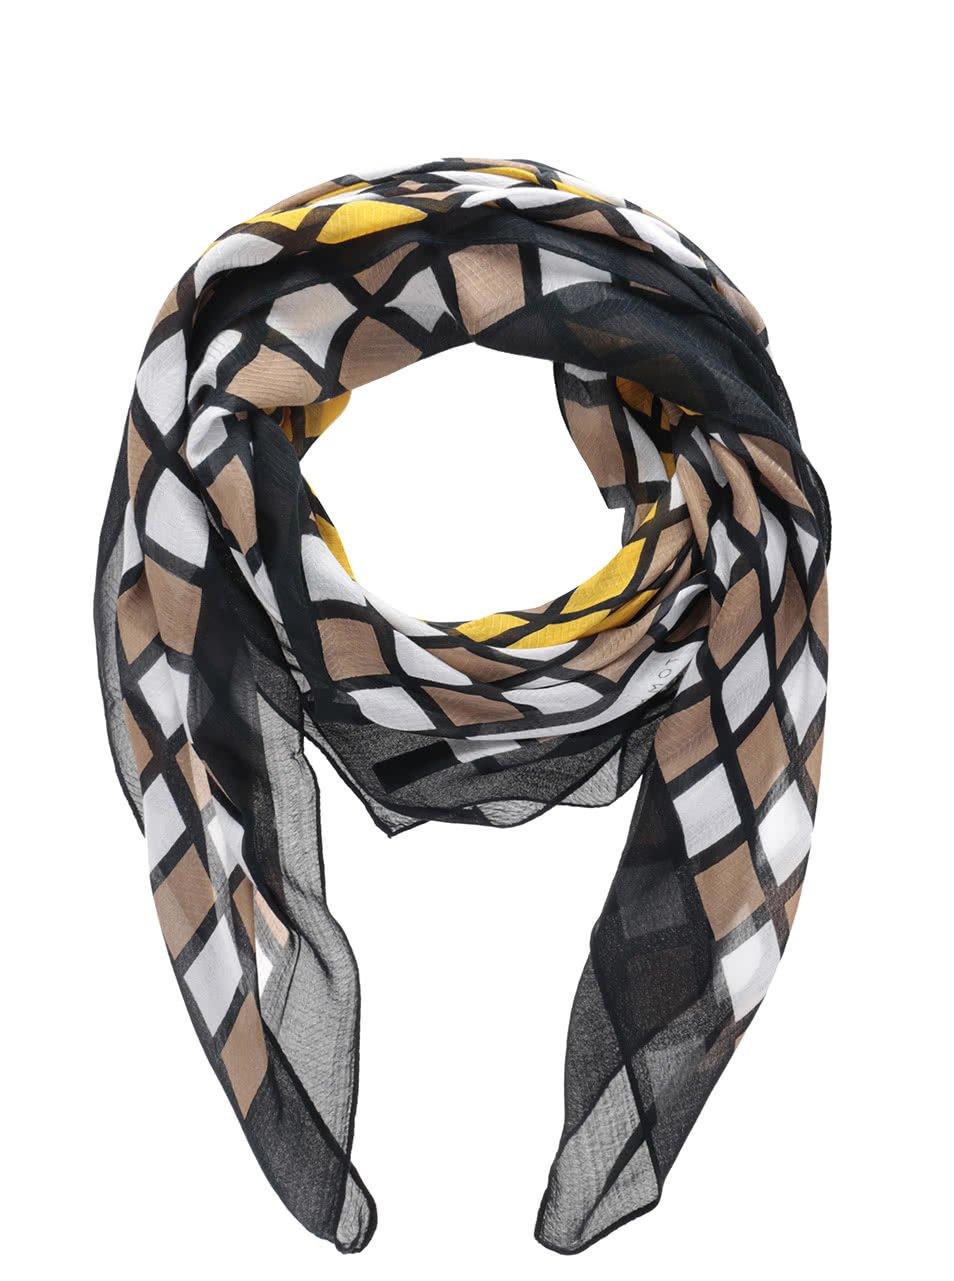 Hnědo-černý dámský vzorovaný šátek Tommy Hilfiger